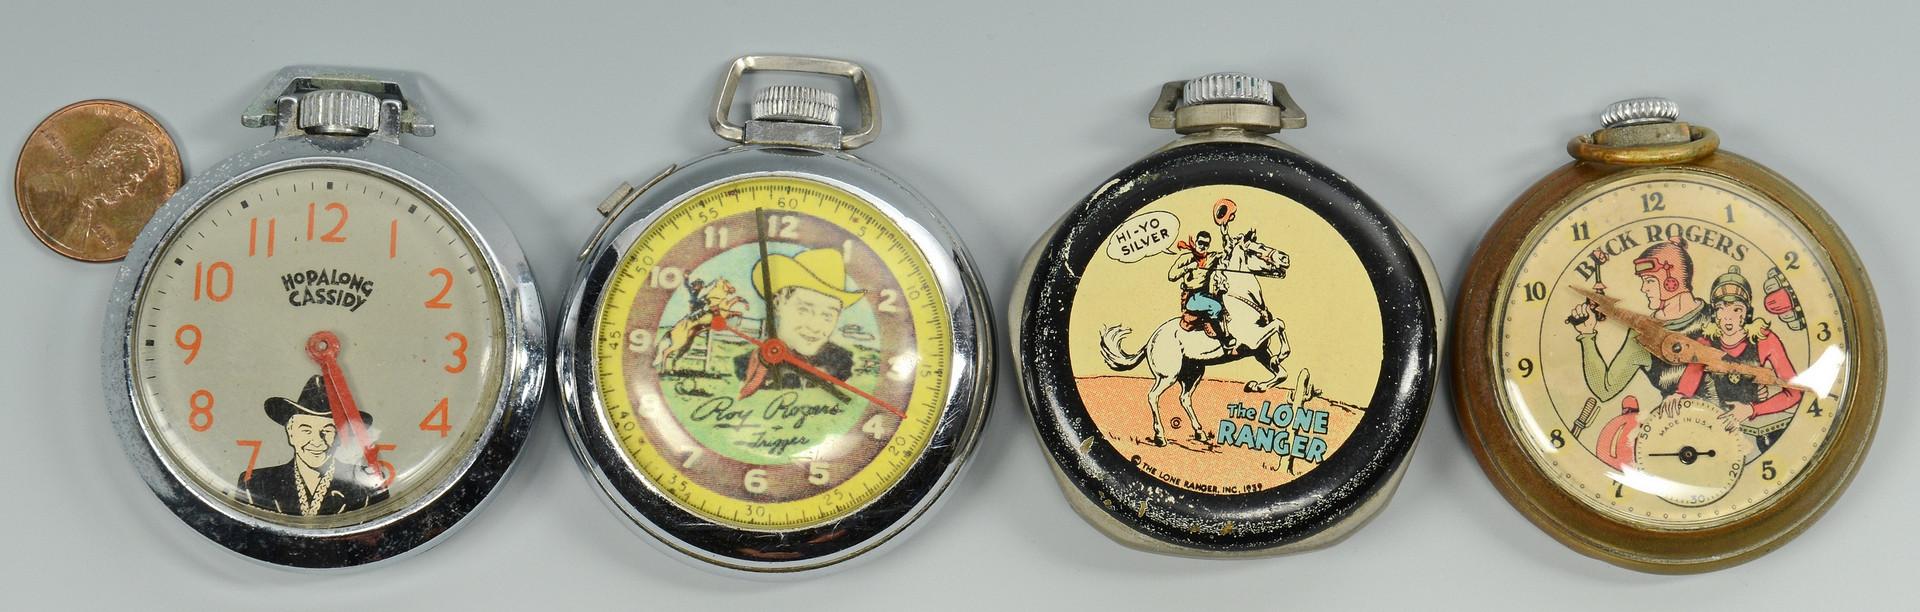 Lot 750: 4 Vintage Pocket Watches, TV Heroes